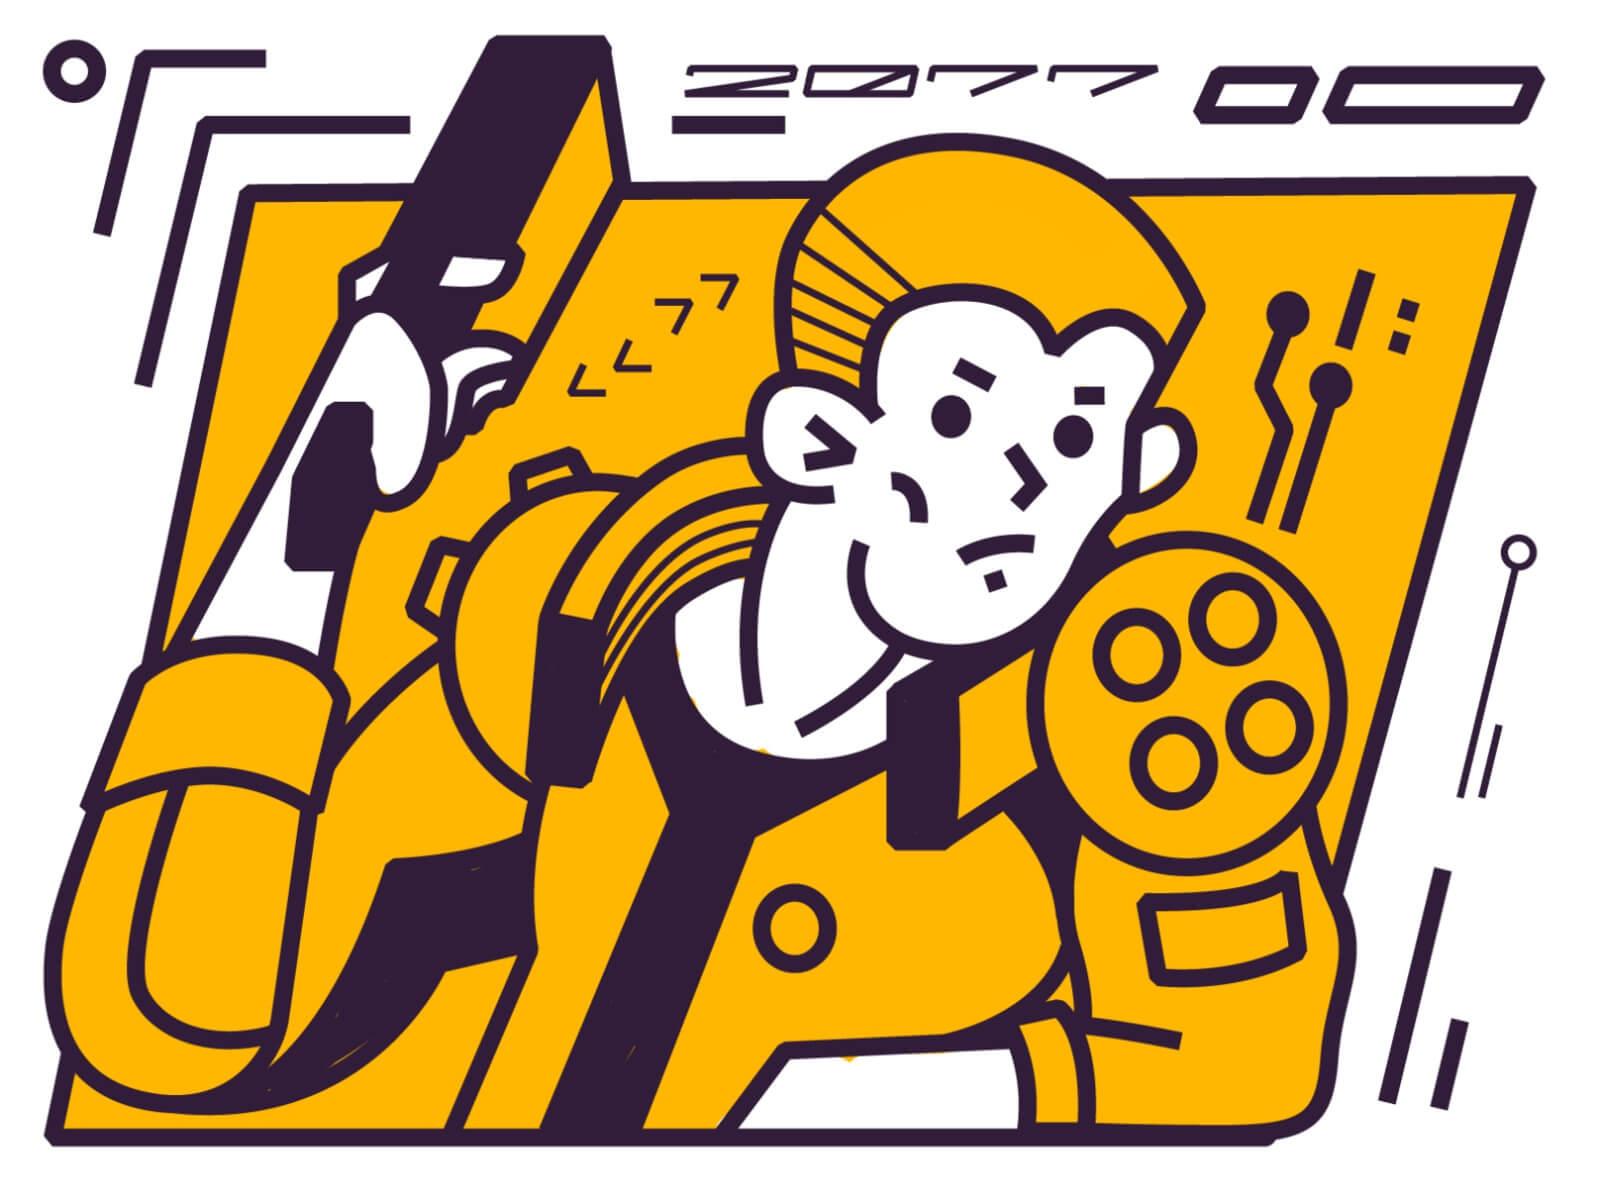 RULE89 ART – Сyberpunk 2077